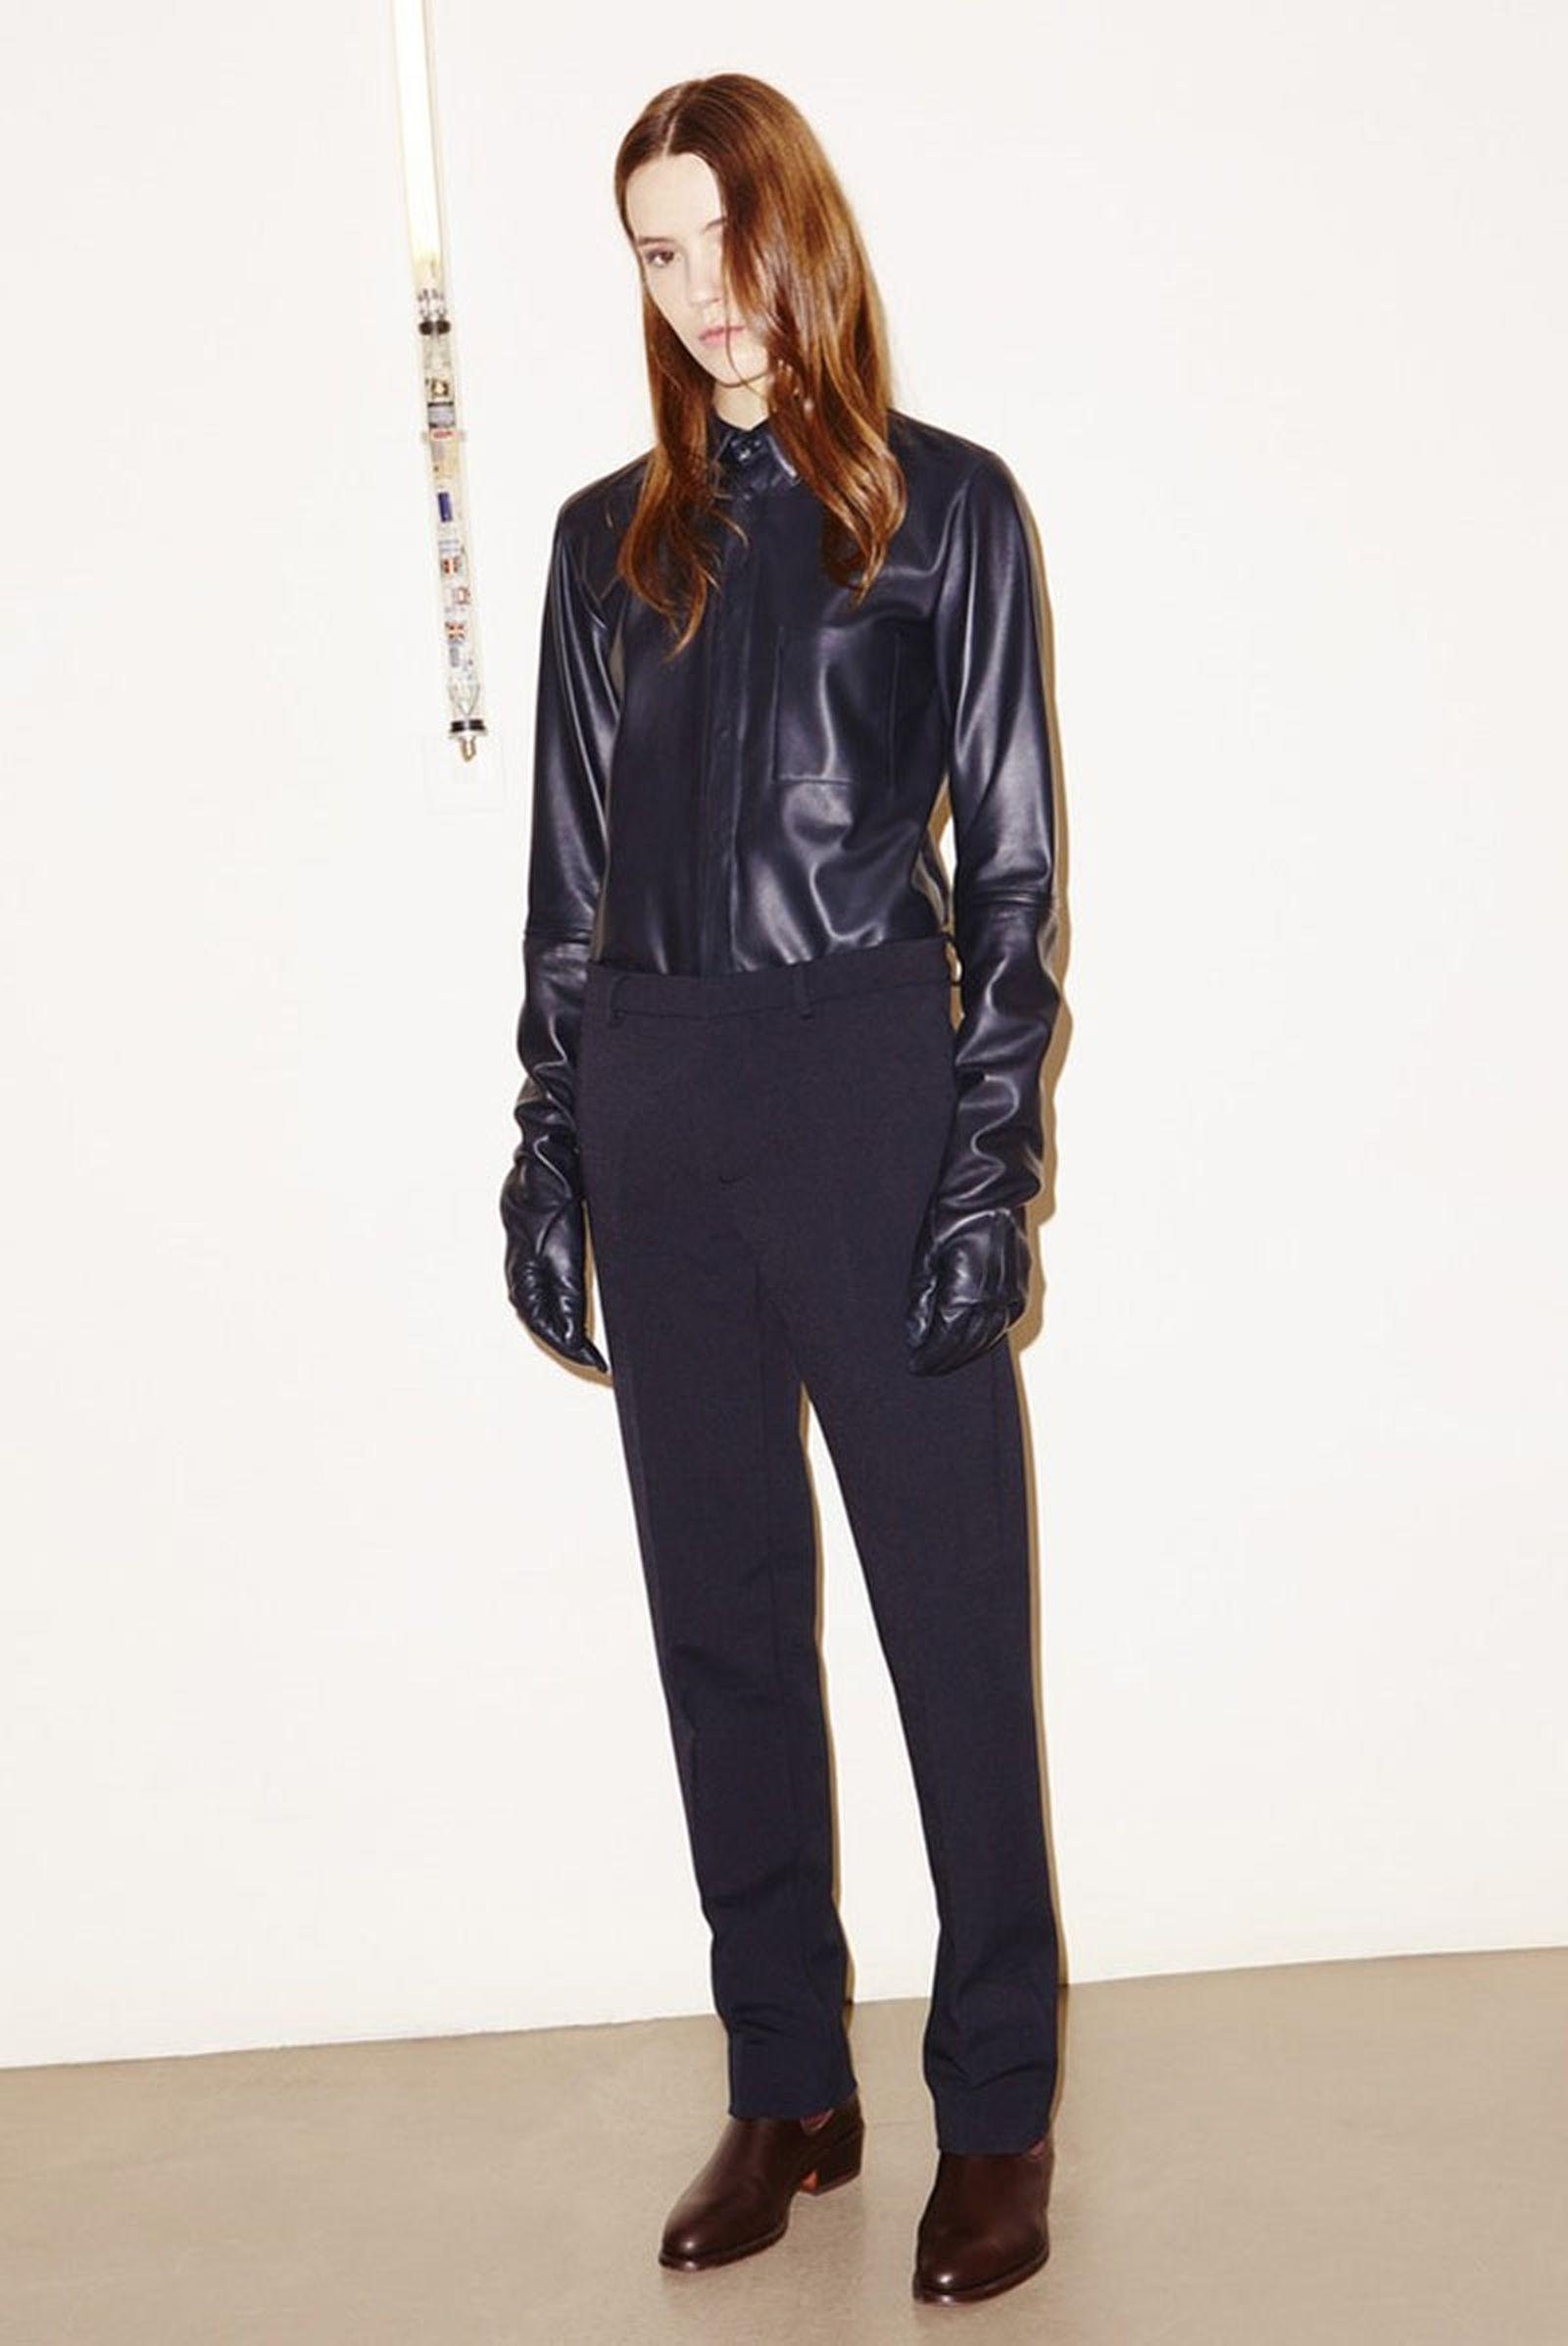 german clothing brands kostas murkadis 023c Adidas Boulezar